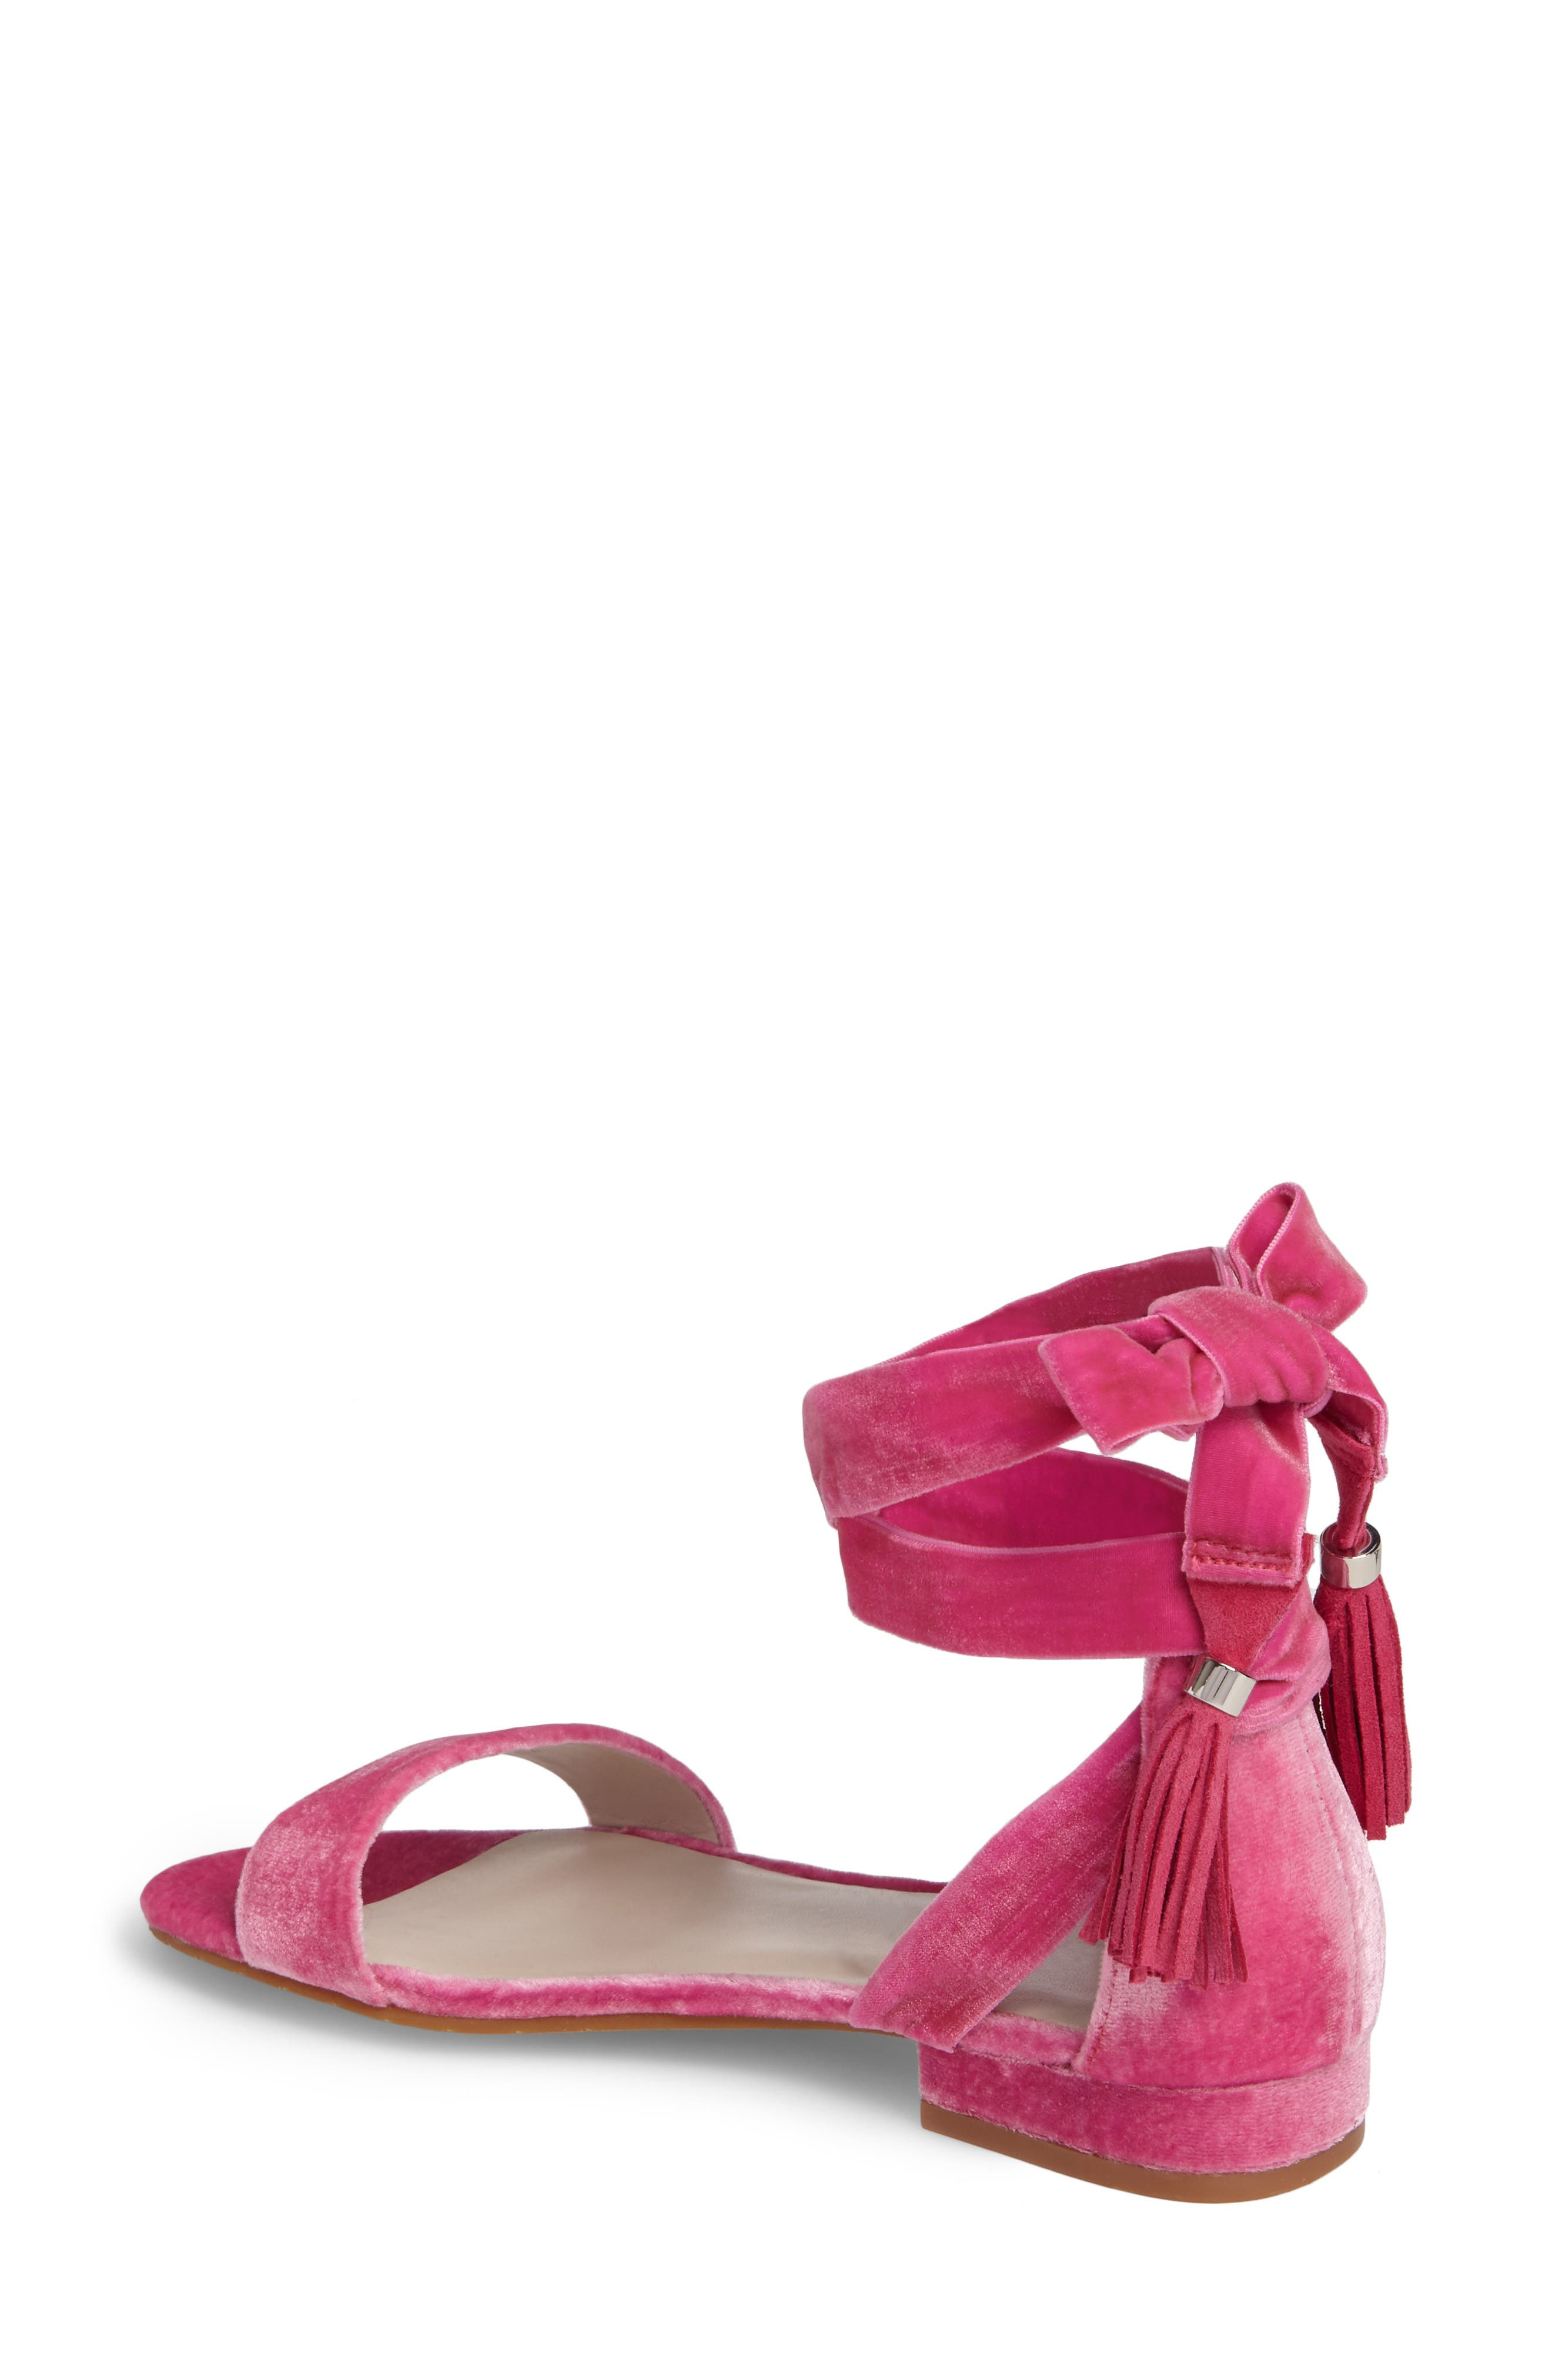 Valen Tassel Lace-Up Sandal,                             Alternate thumbnail 26, color,